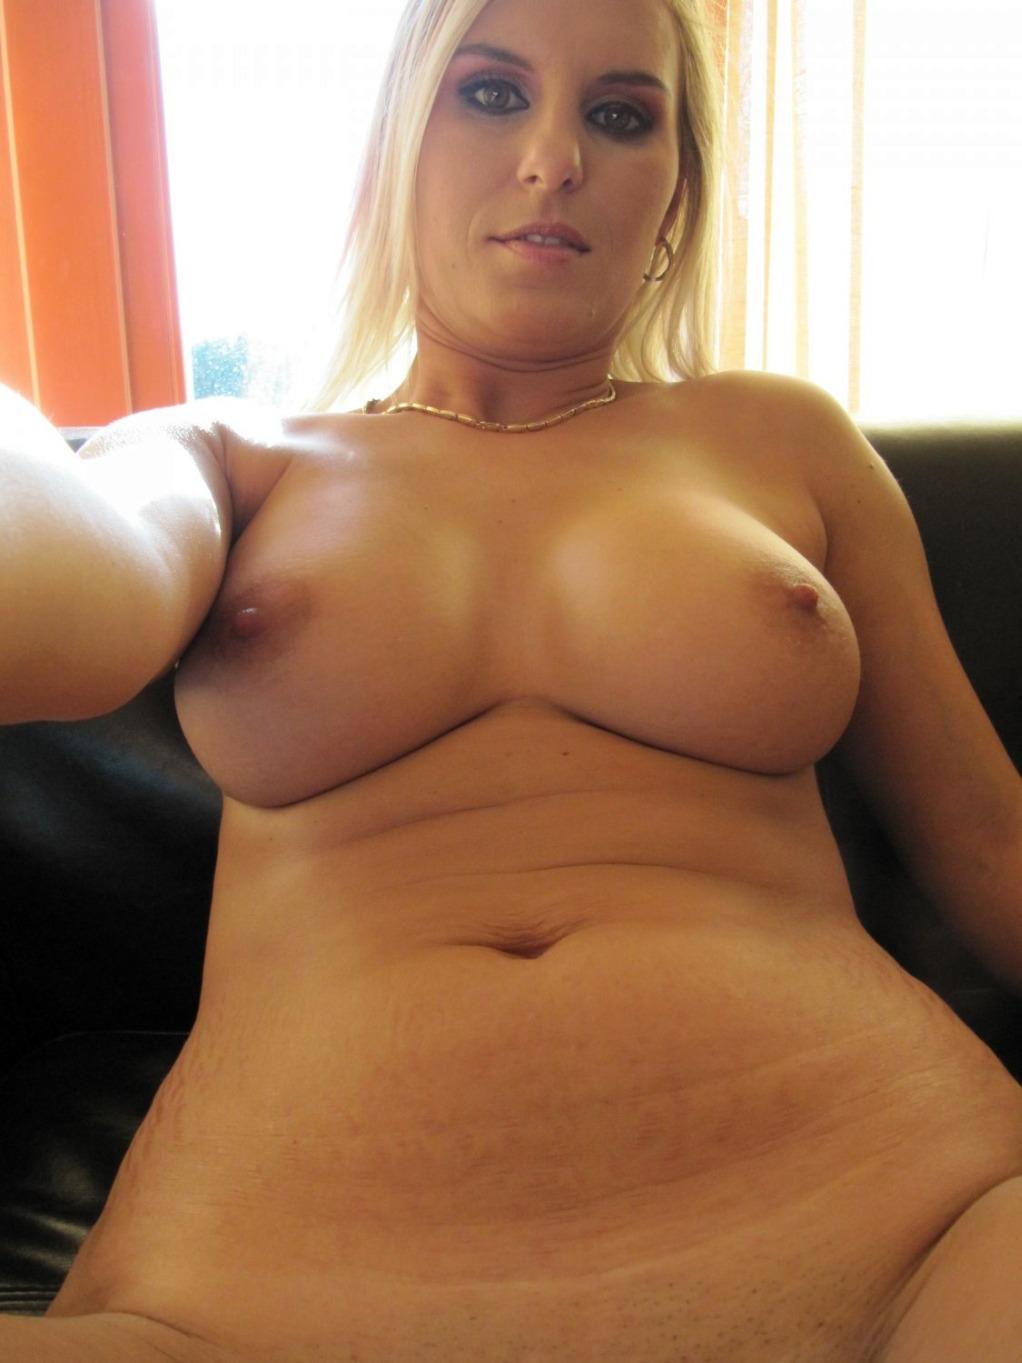 blonde Fotze